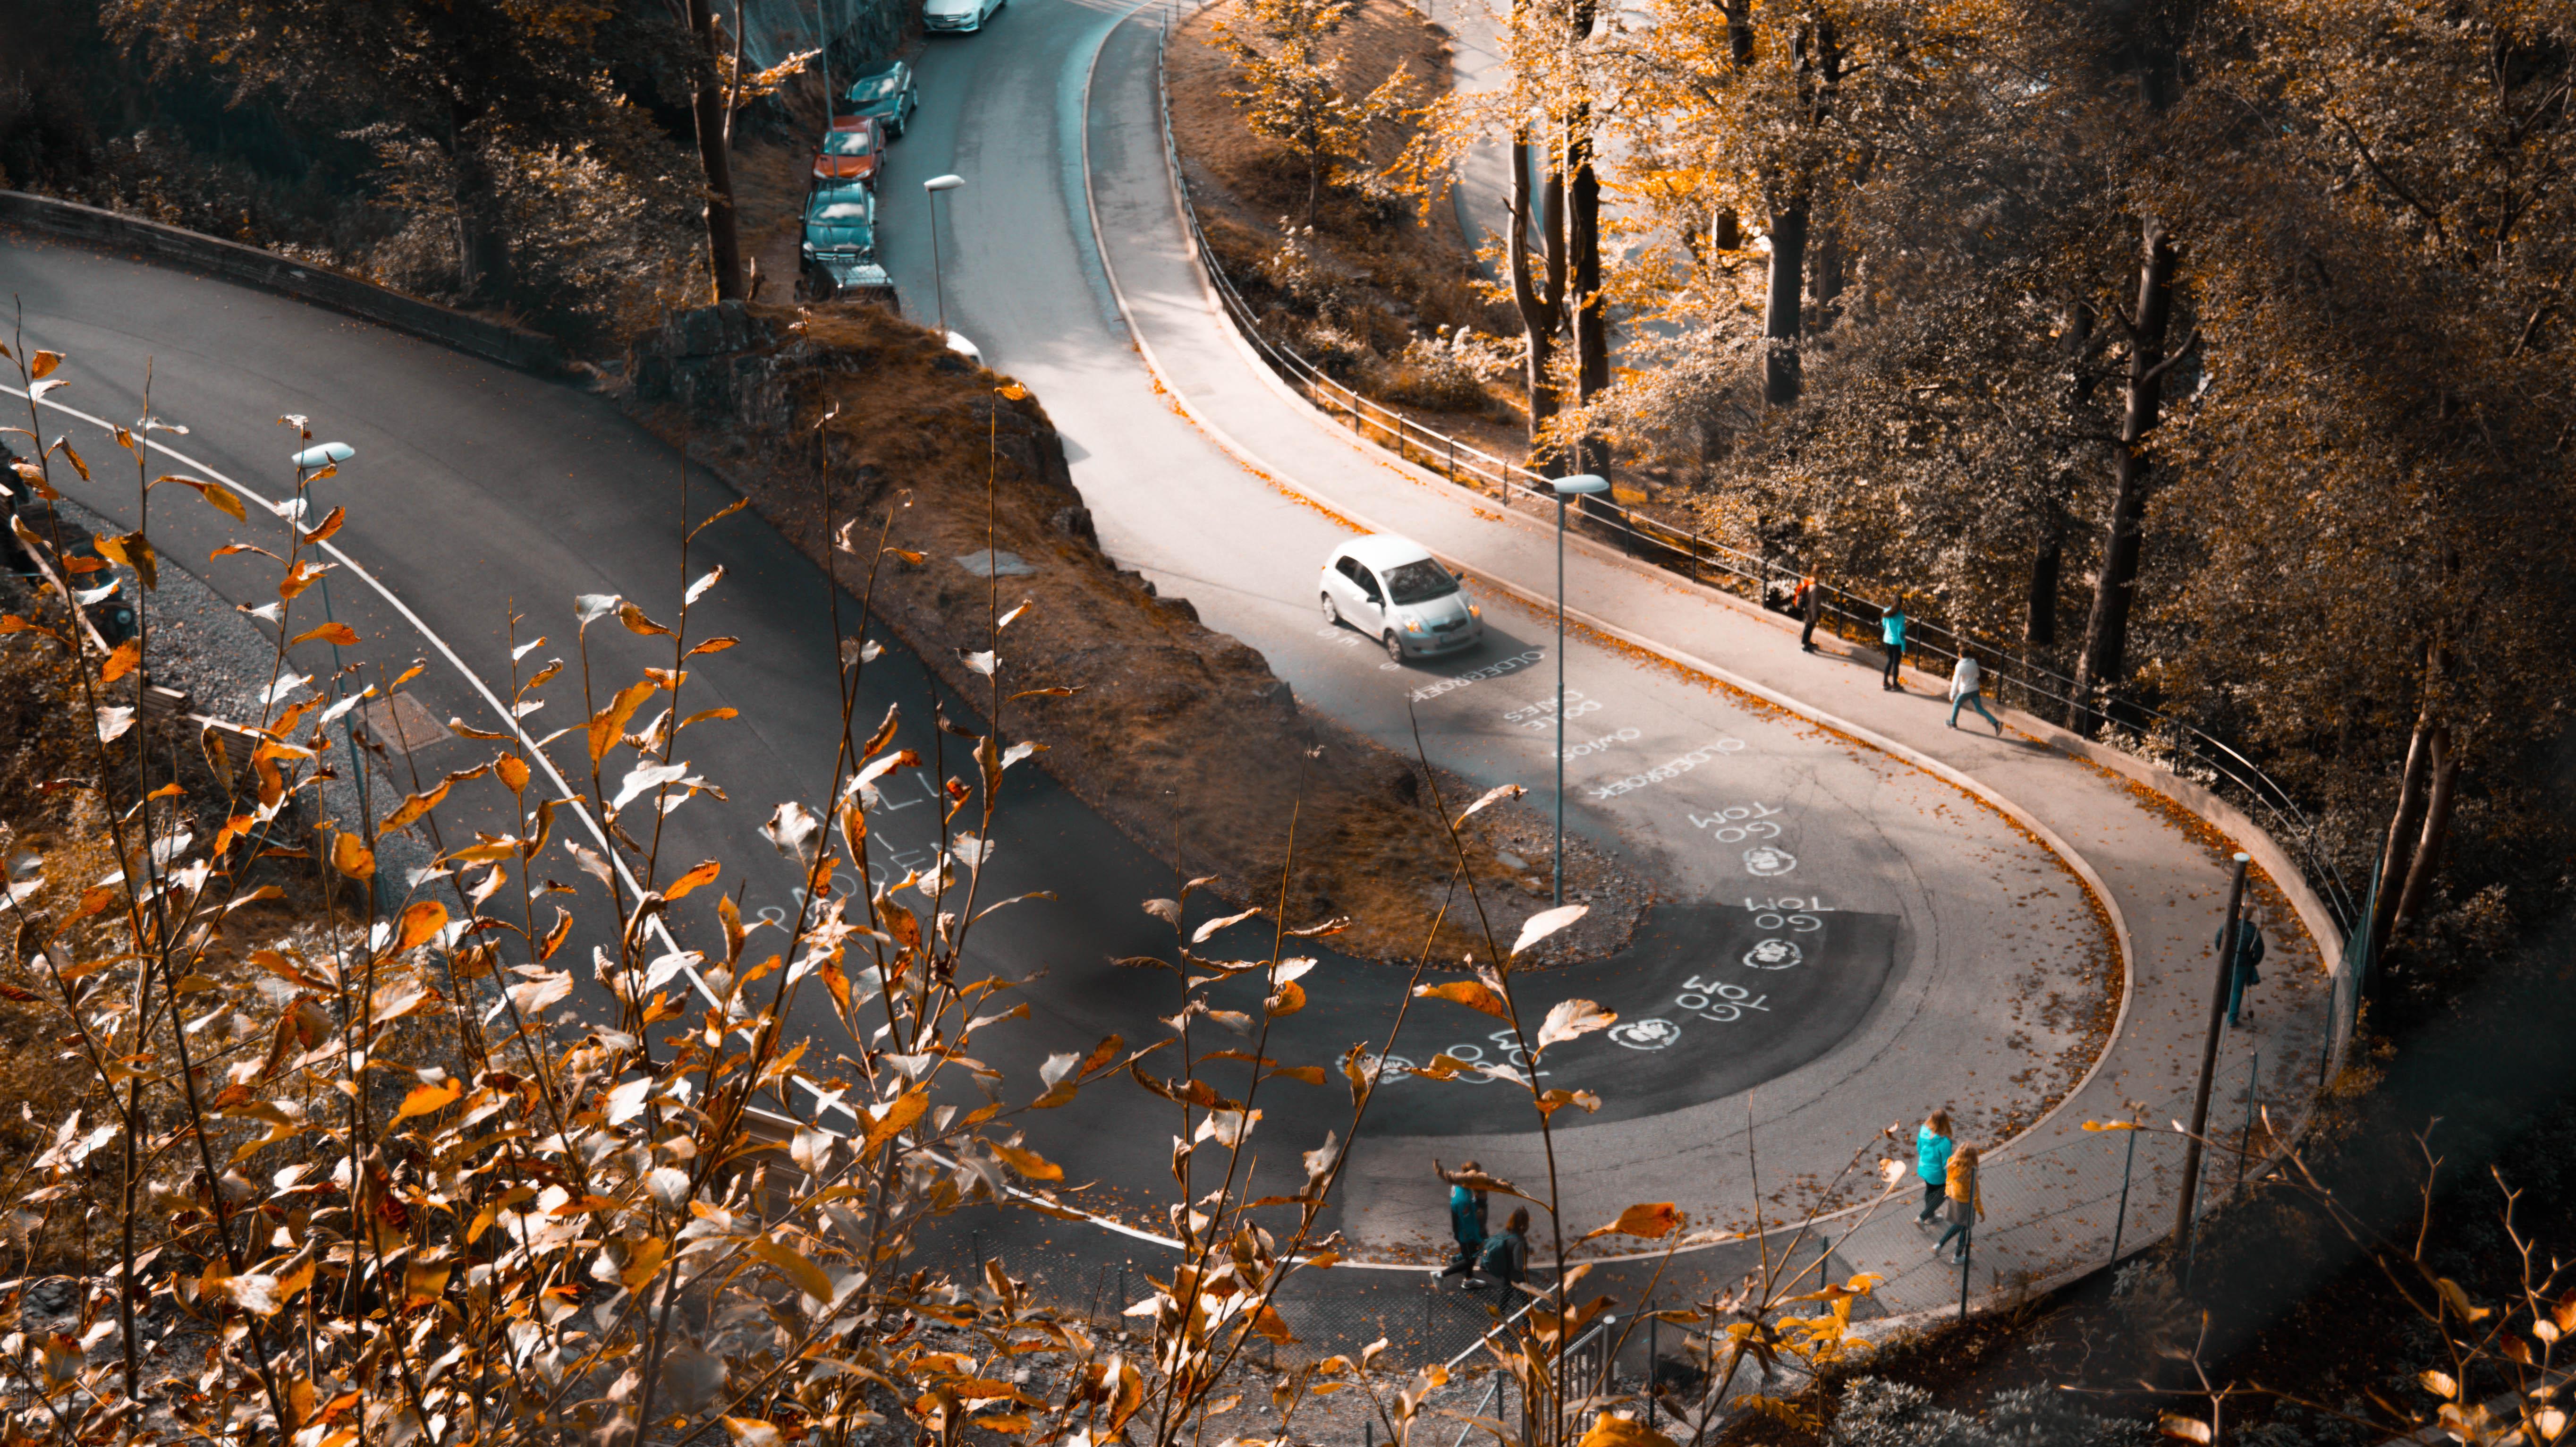 Autumn Road Orange Leaves Fallen Cars Peoples Walking 5k